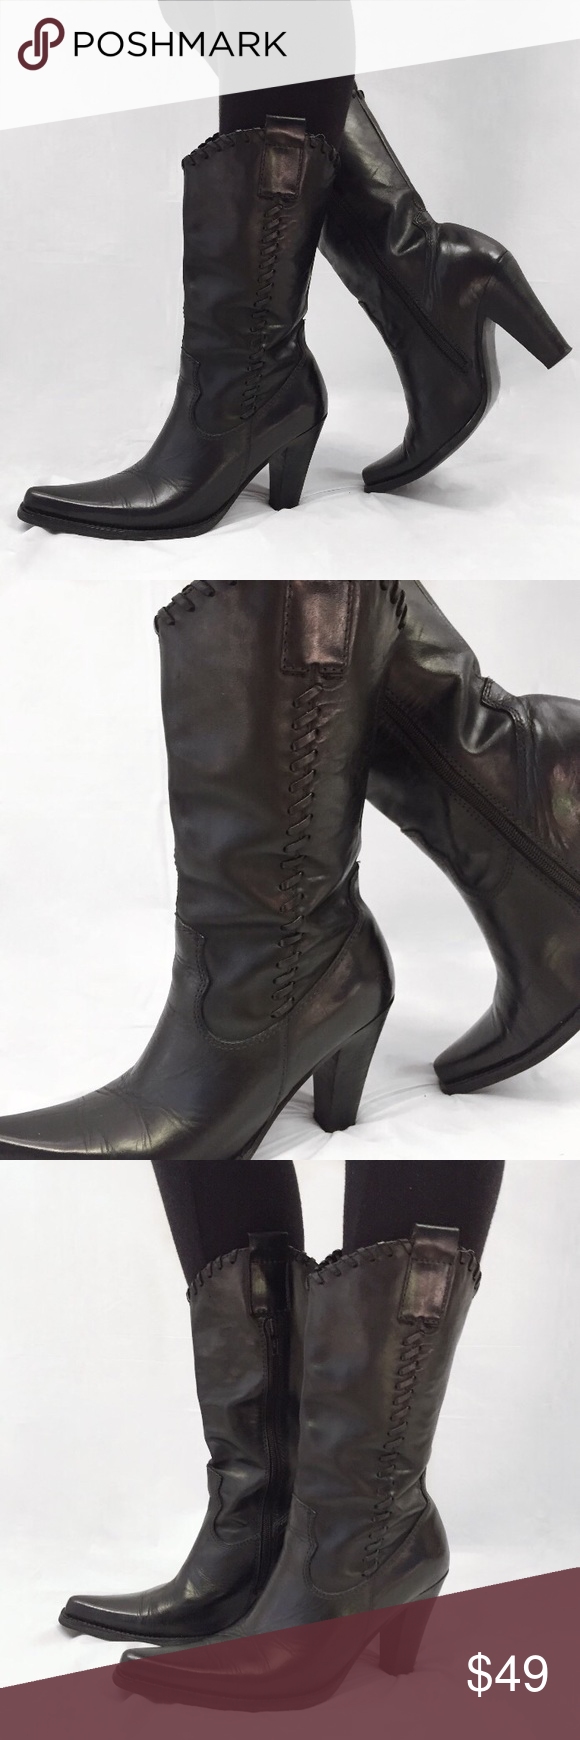 689109bed5c Steve Madden cowboy boots Black brown cowboy boots 🤠side zipper ...